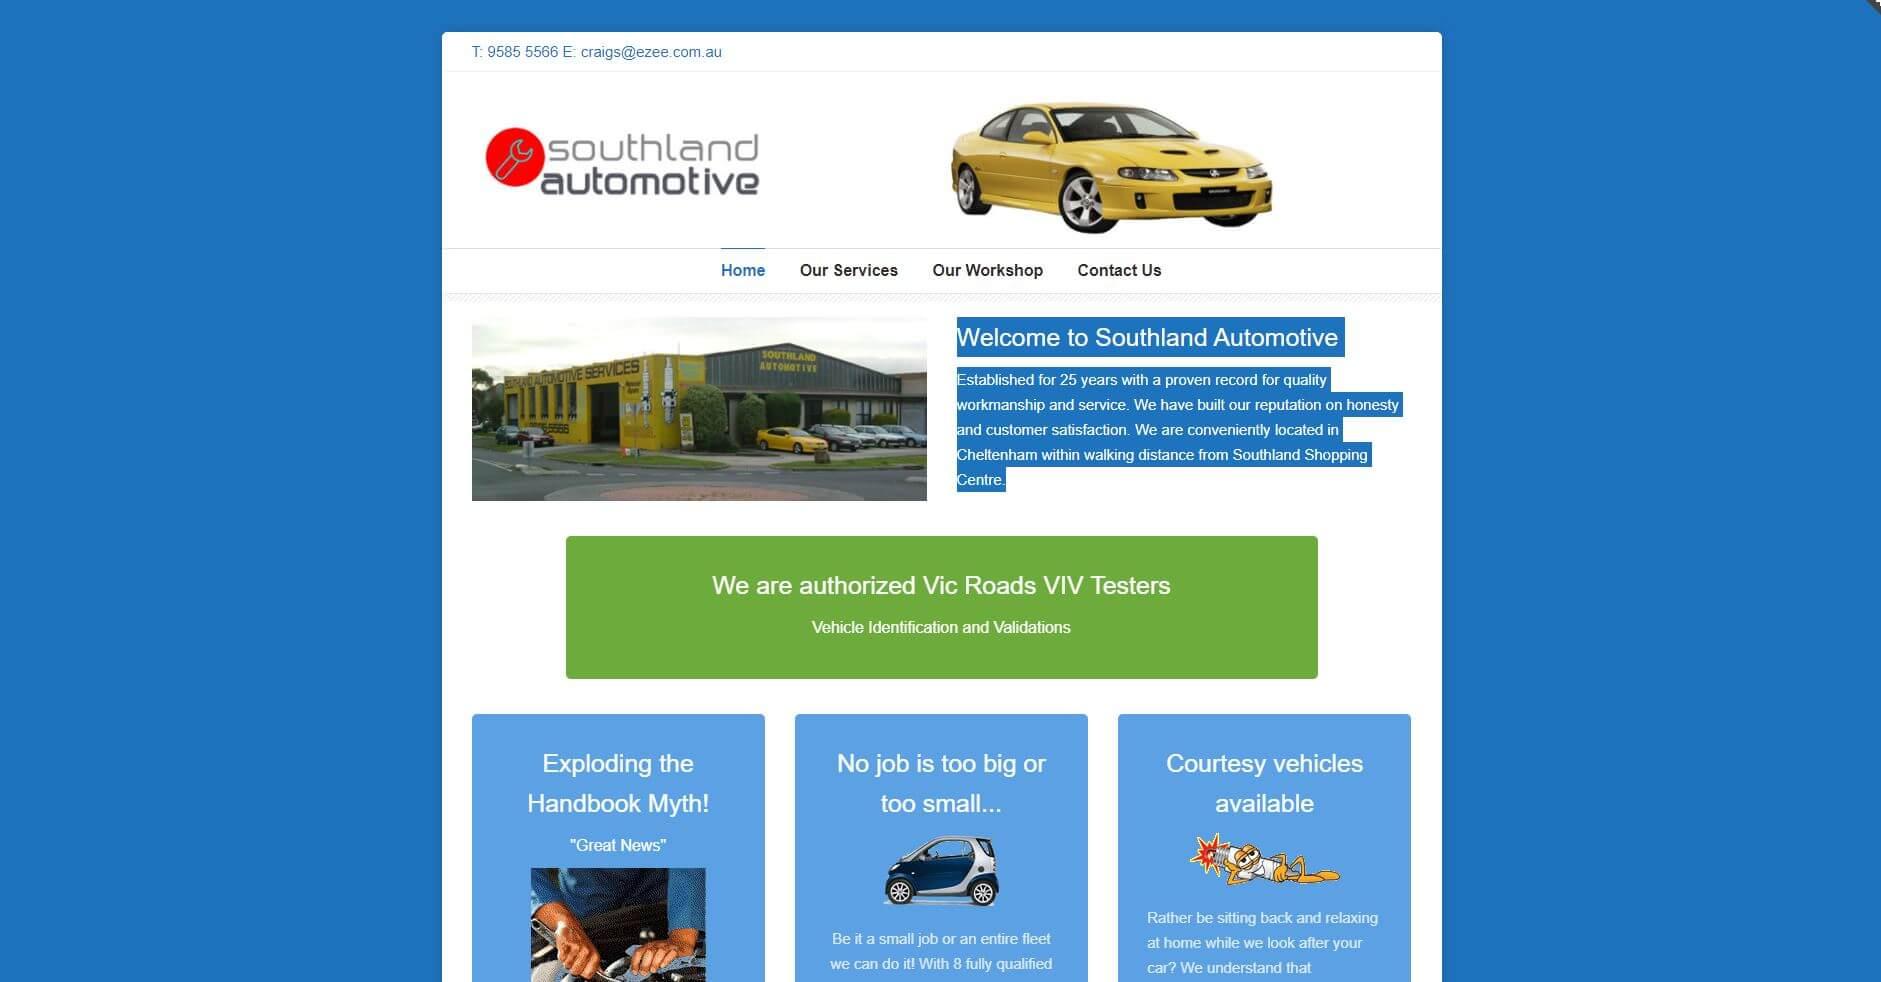 Southland Automotive